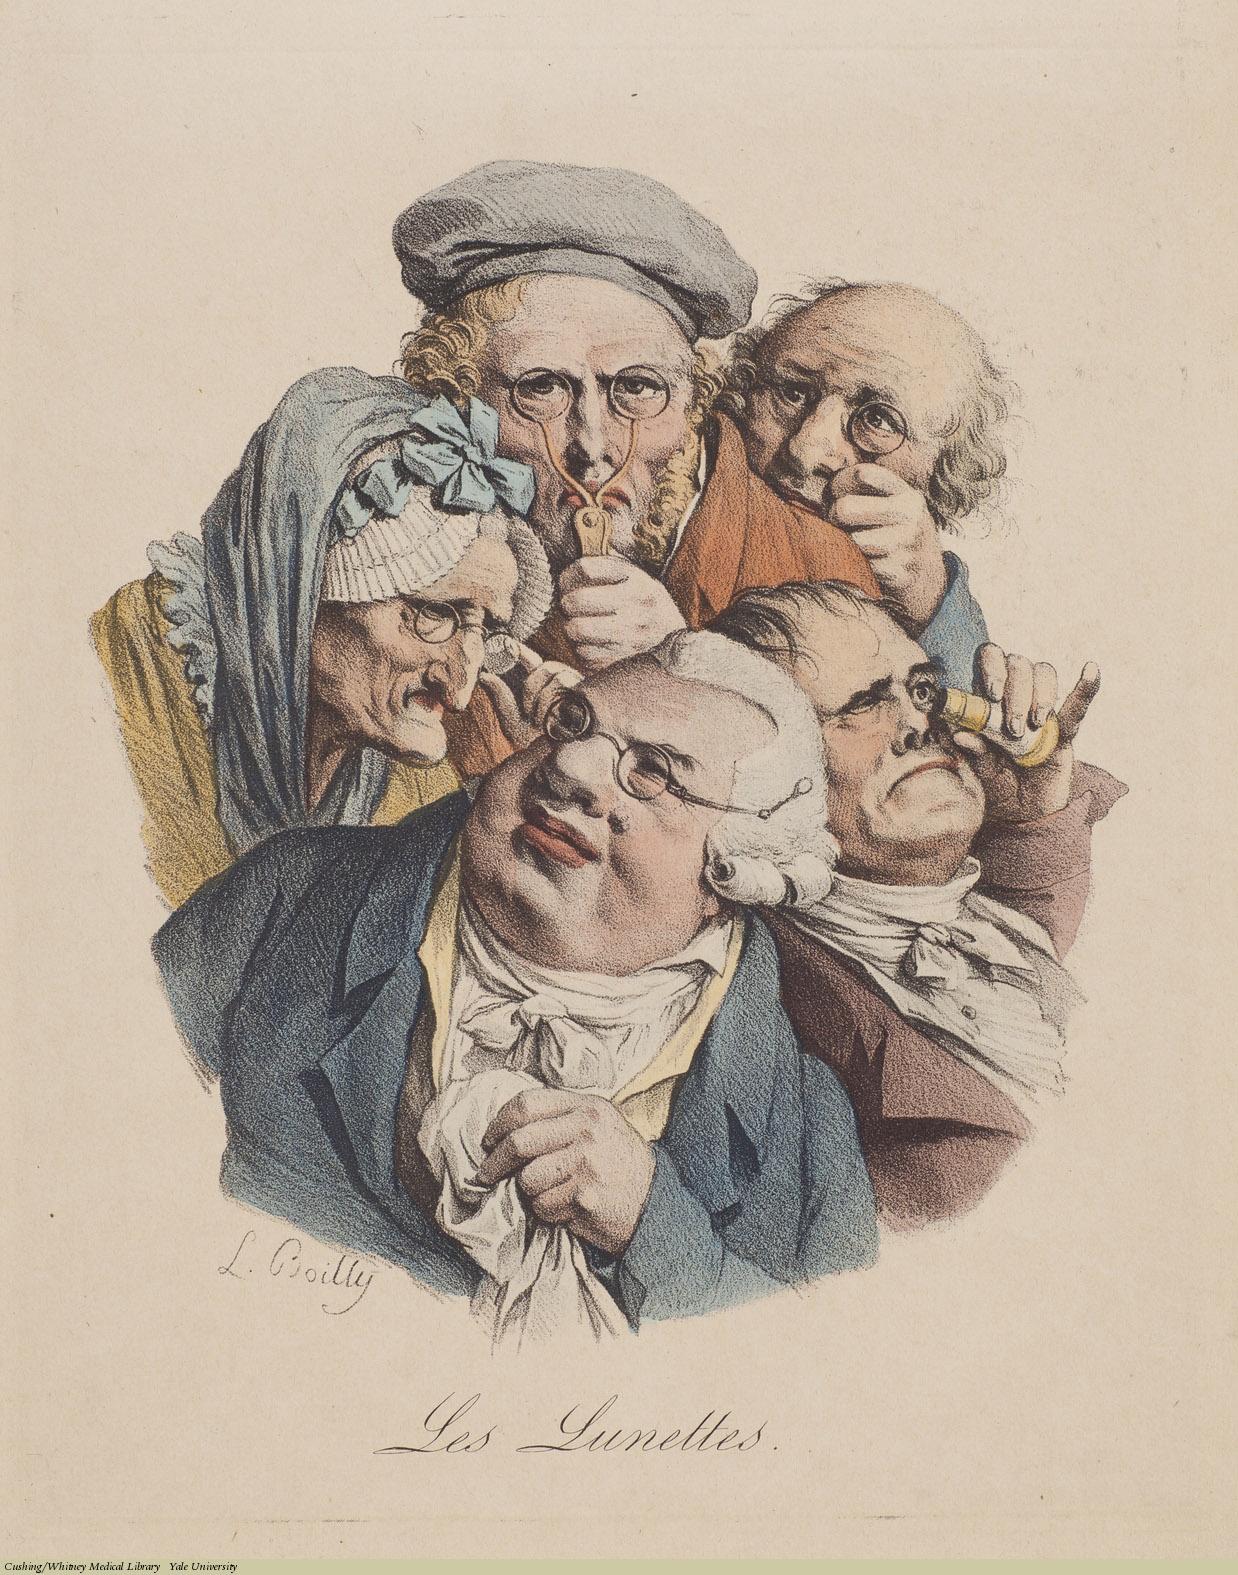 Louis-Léopold Boilly, Les Lunettes (Eyeglasses), Lithograph, undated.